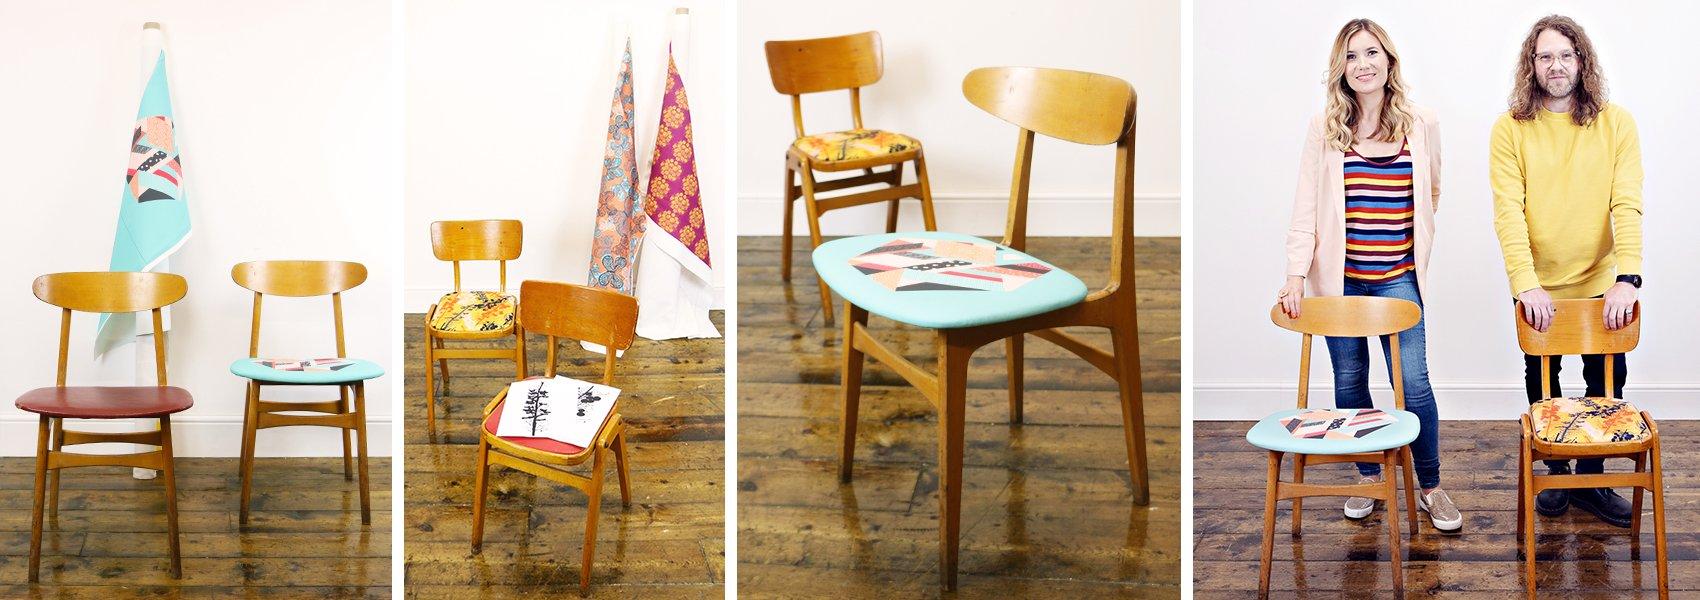 Interiors Masterclasses | Make It In Design